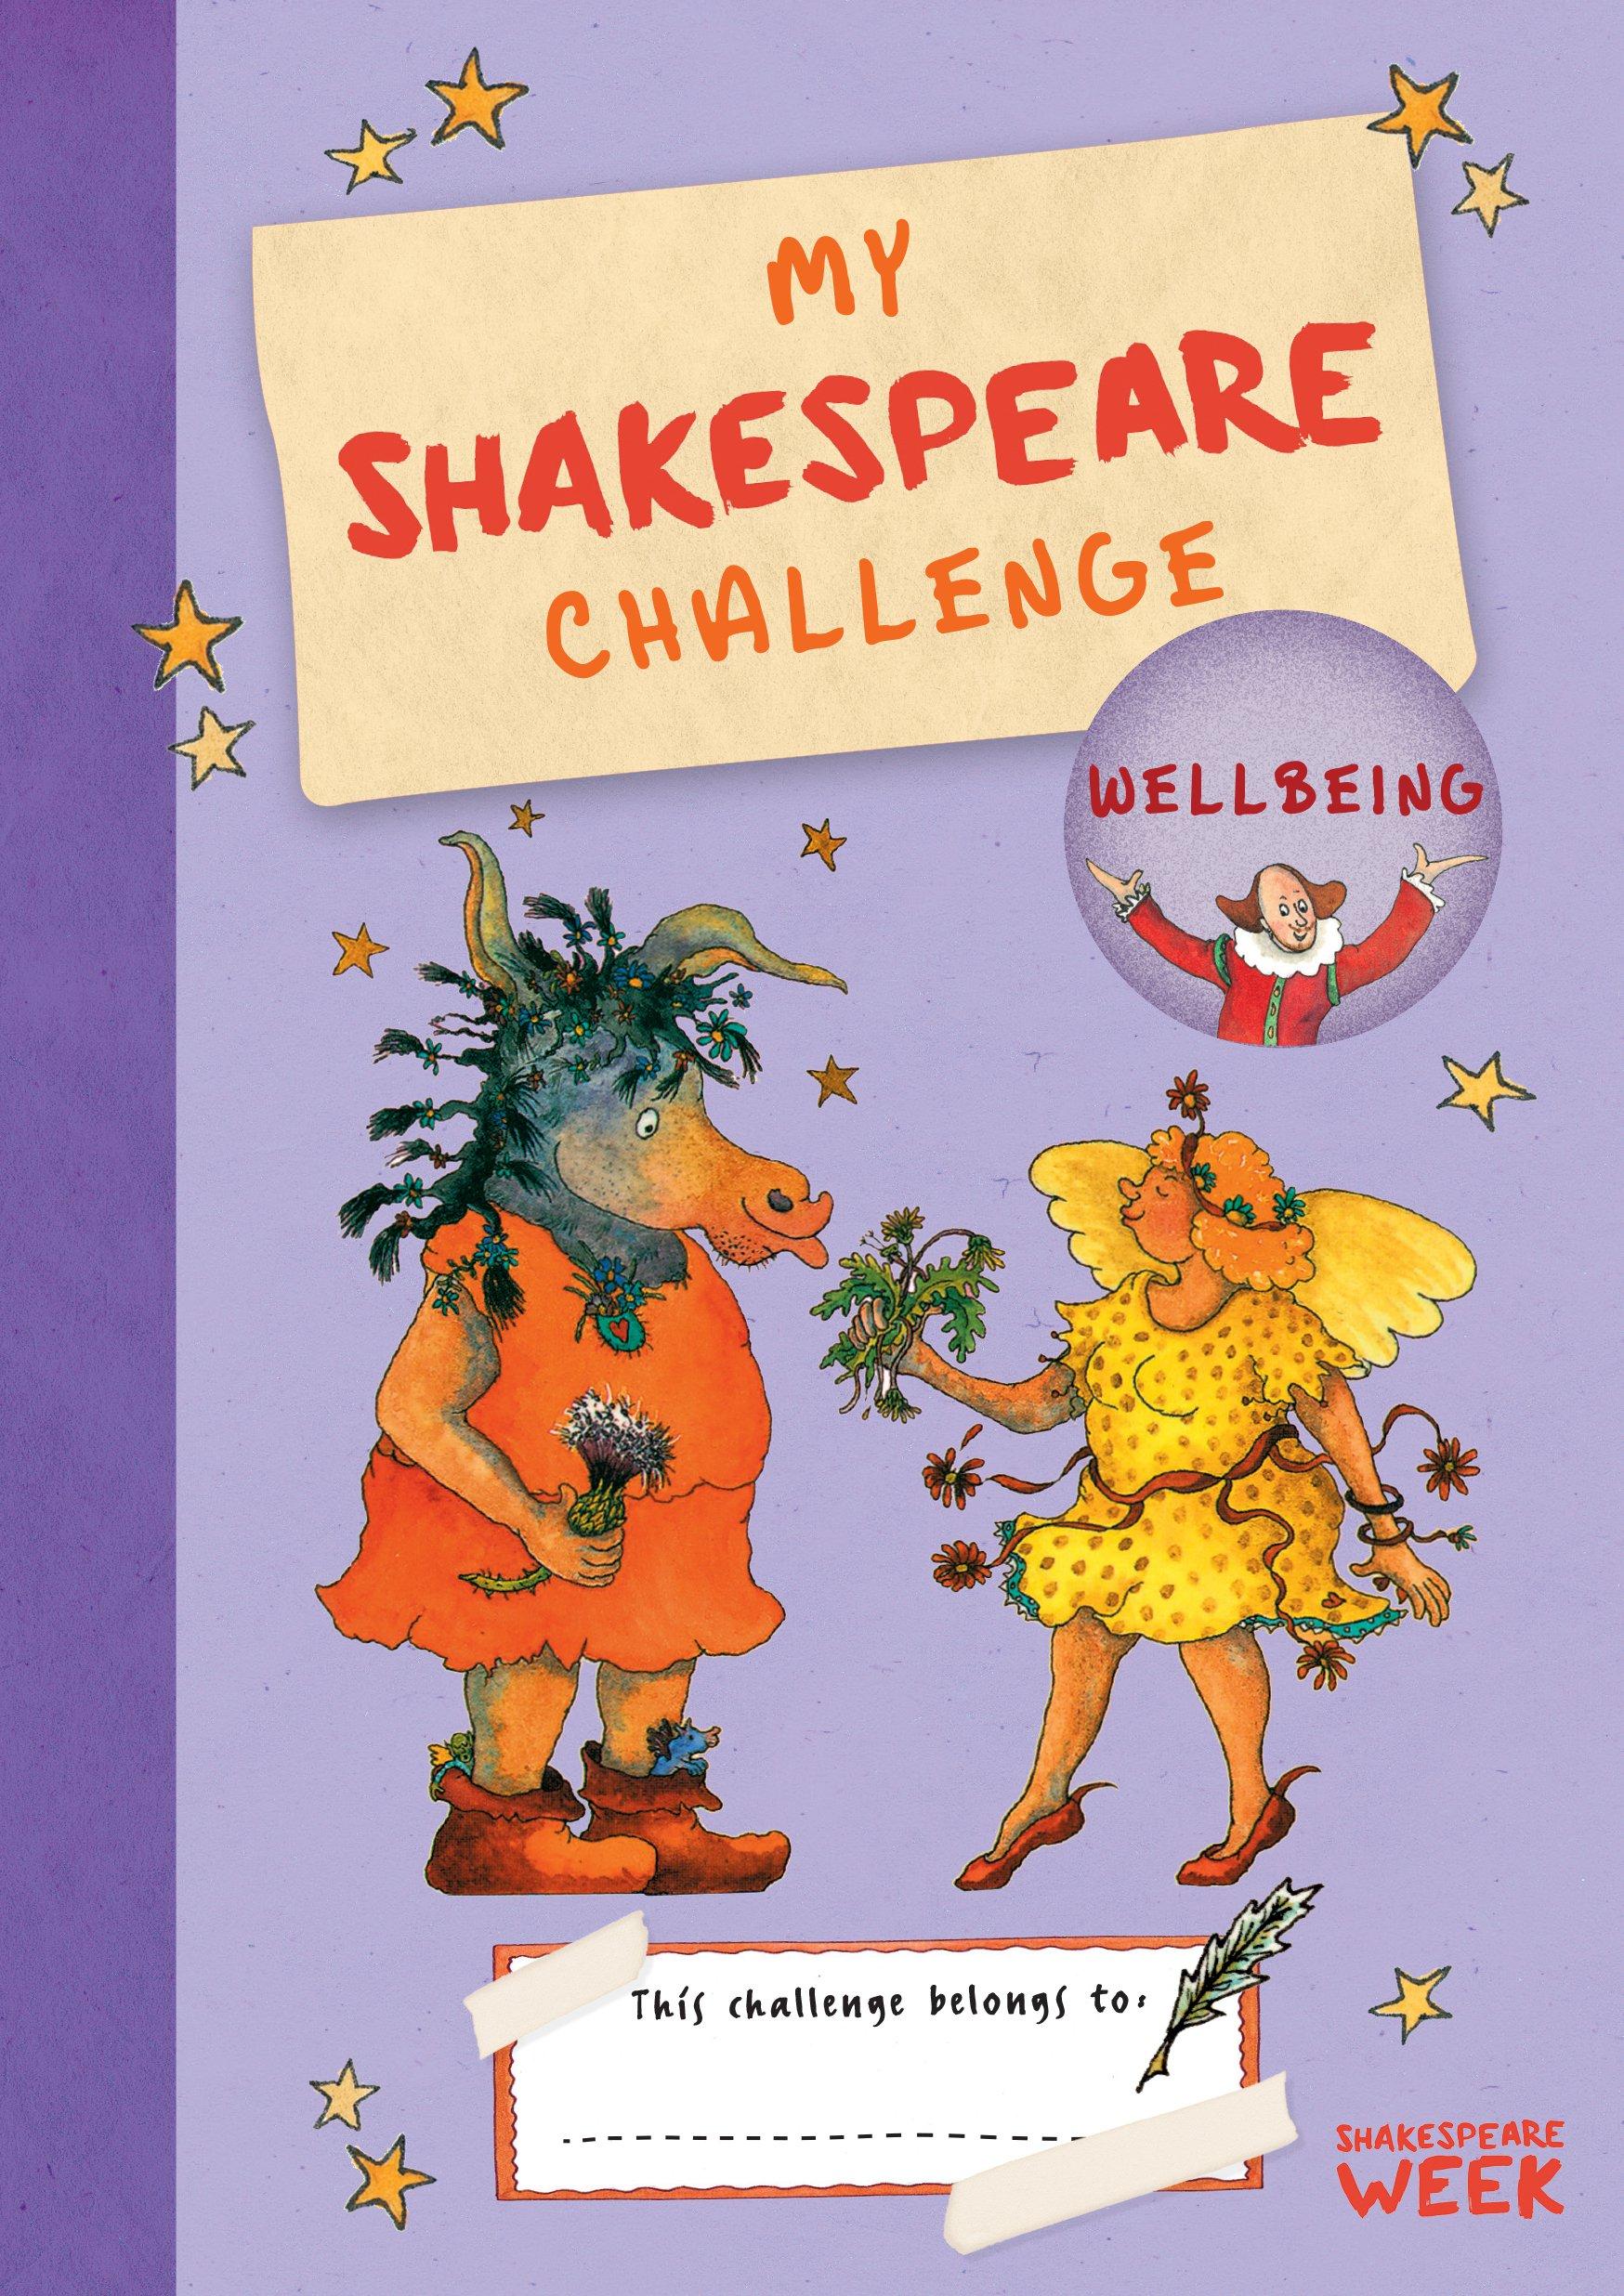 SBT_Wellbeing_Challenge_Booklet2021_cover.jpg